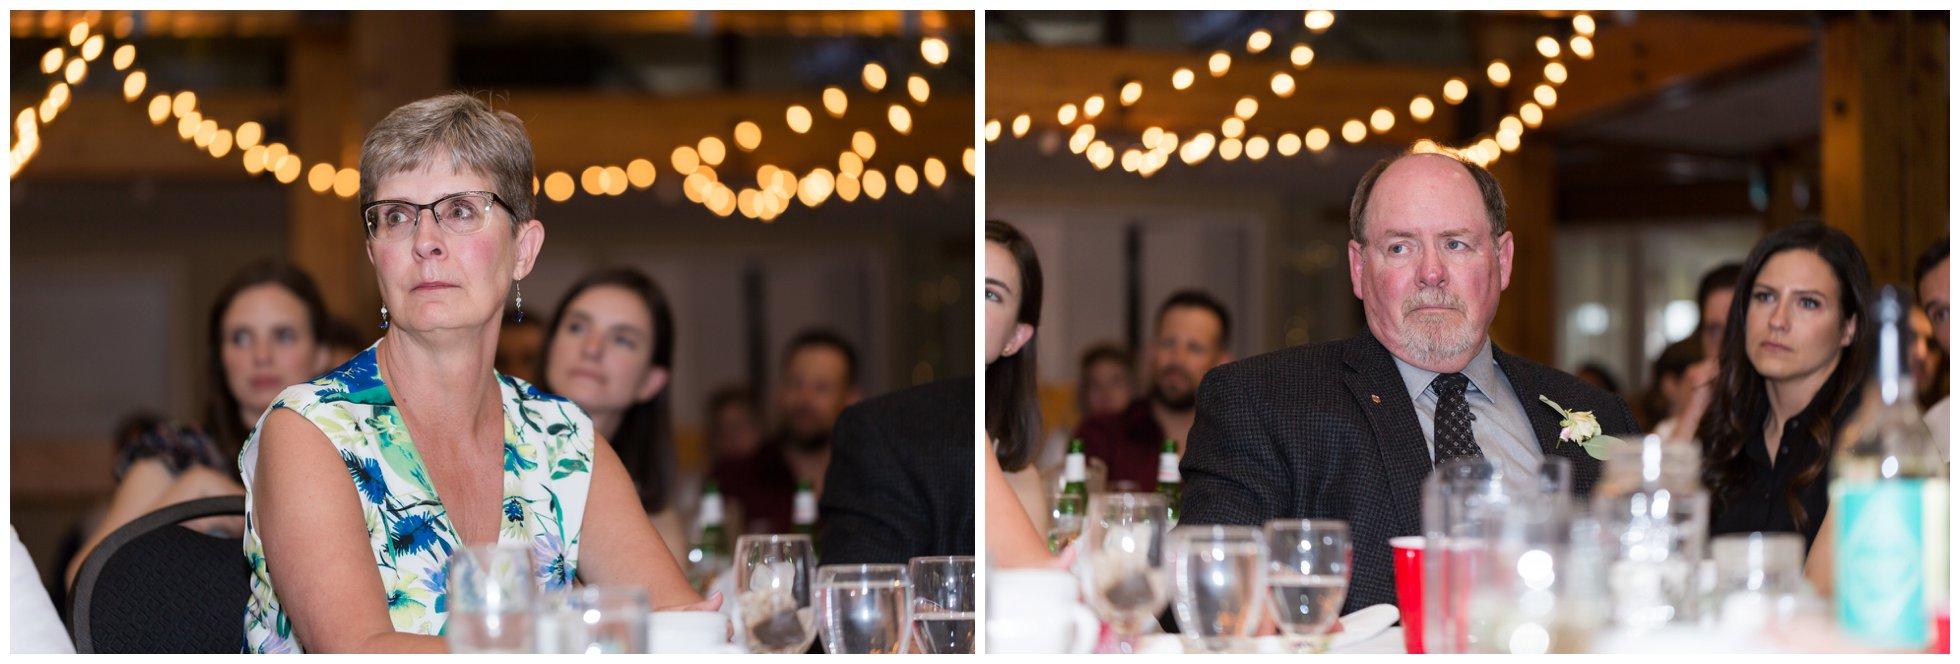 Emily and Royden Edmonton Wedding (Life by Selena Photography)_0048.jpg